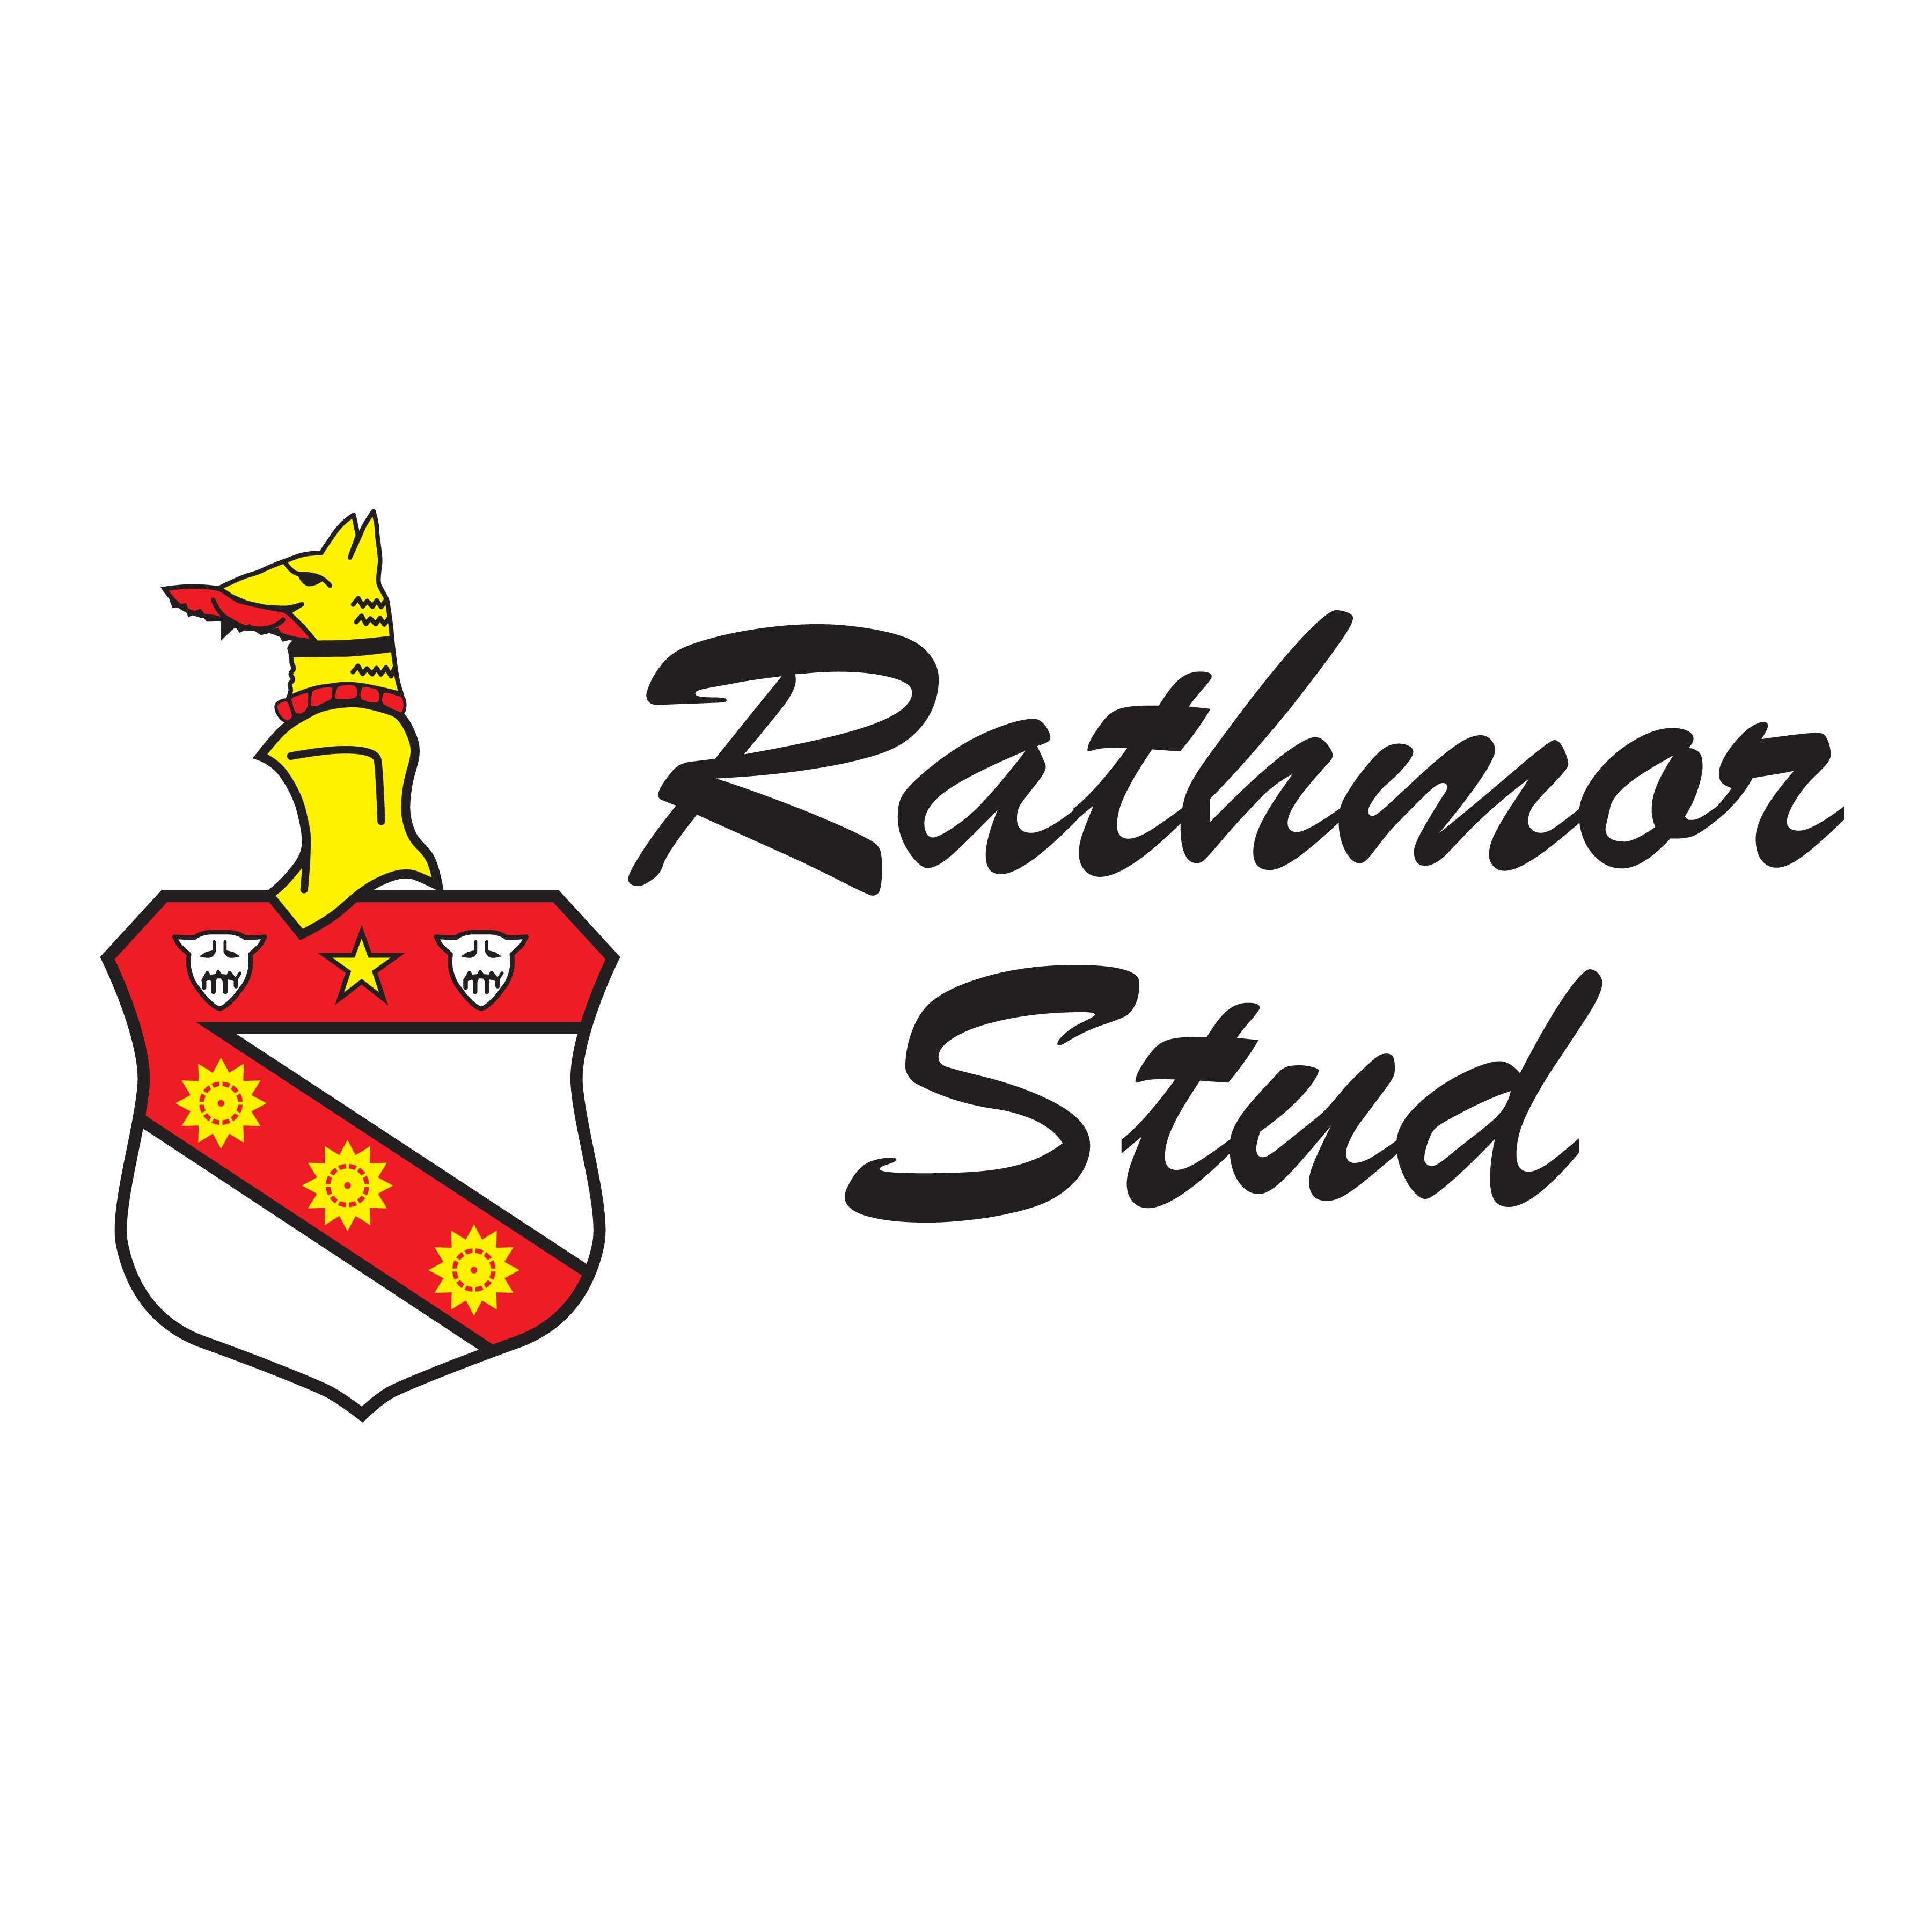 rathmor 3